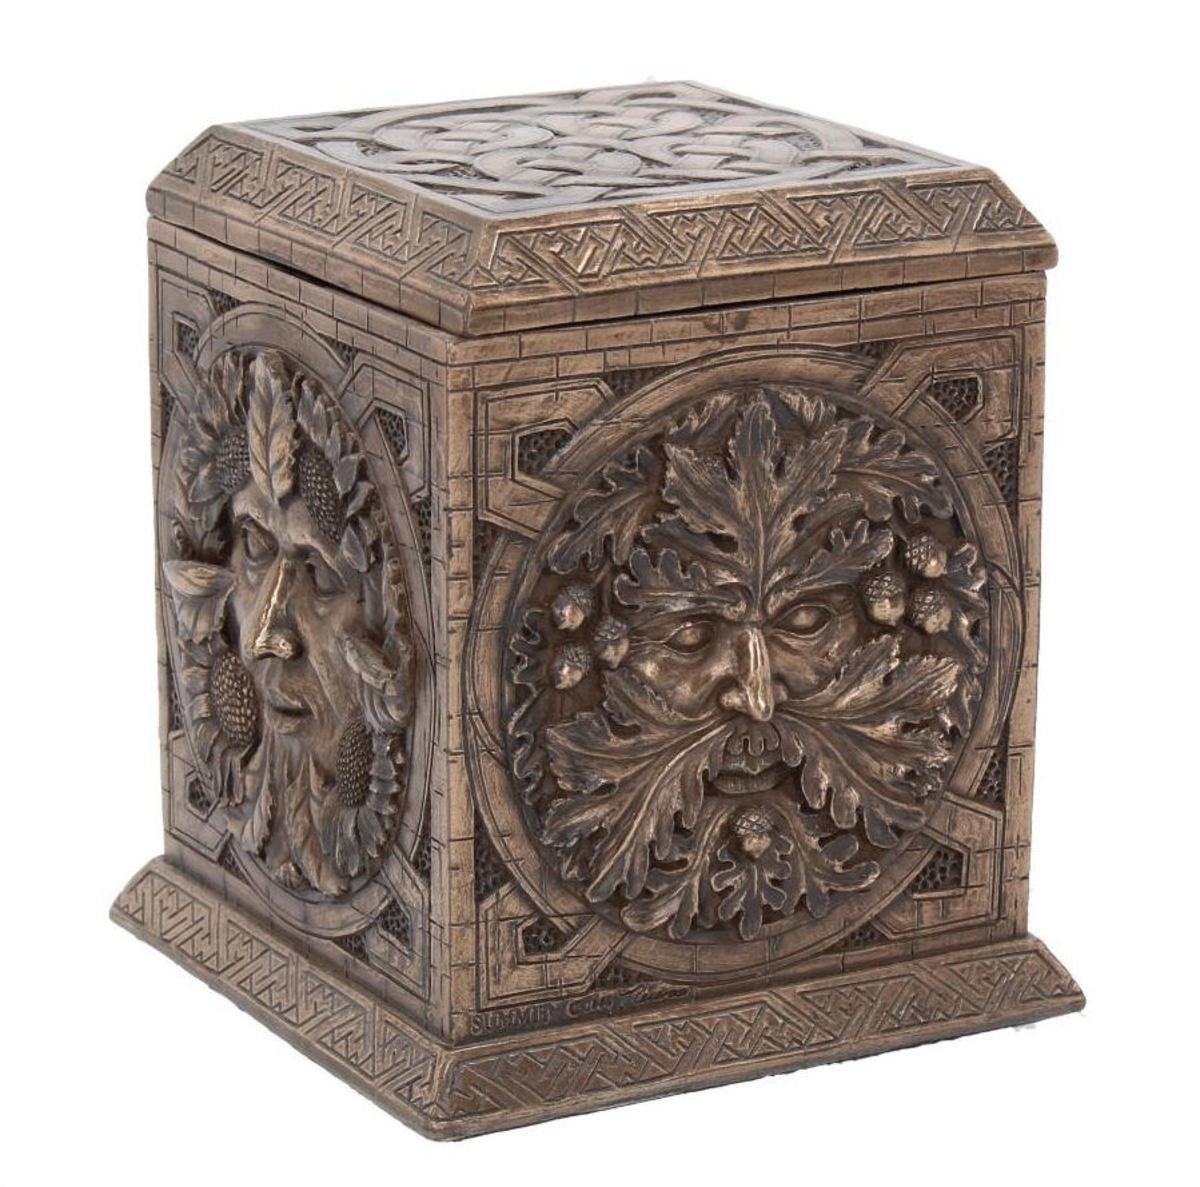 dekorácia (krabička) Seasons of the Craft - NEM4087